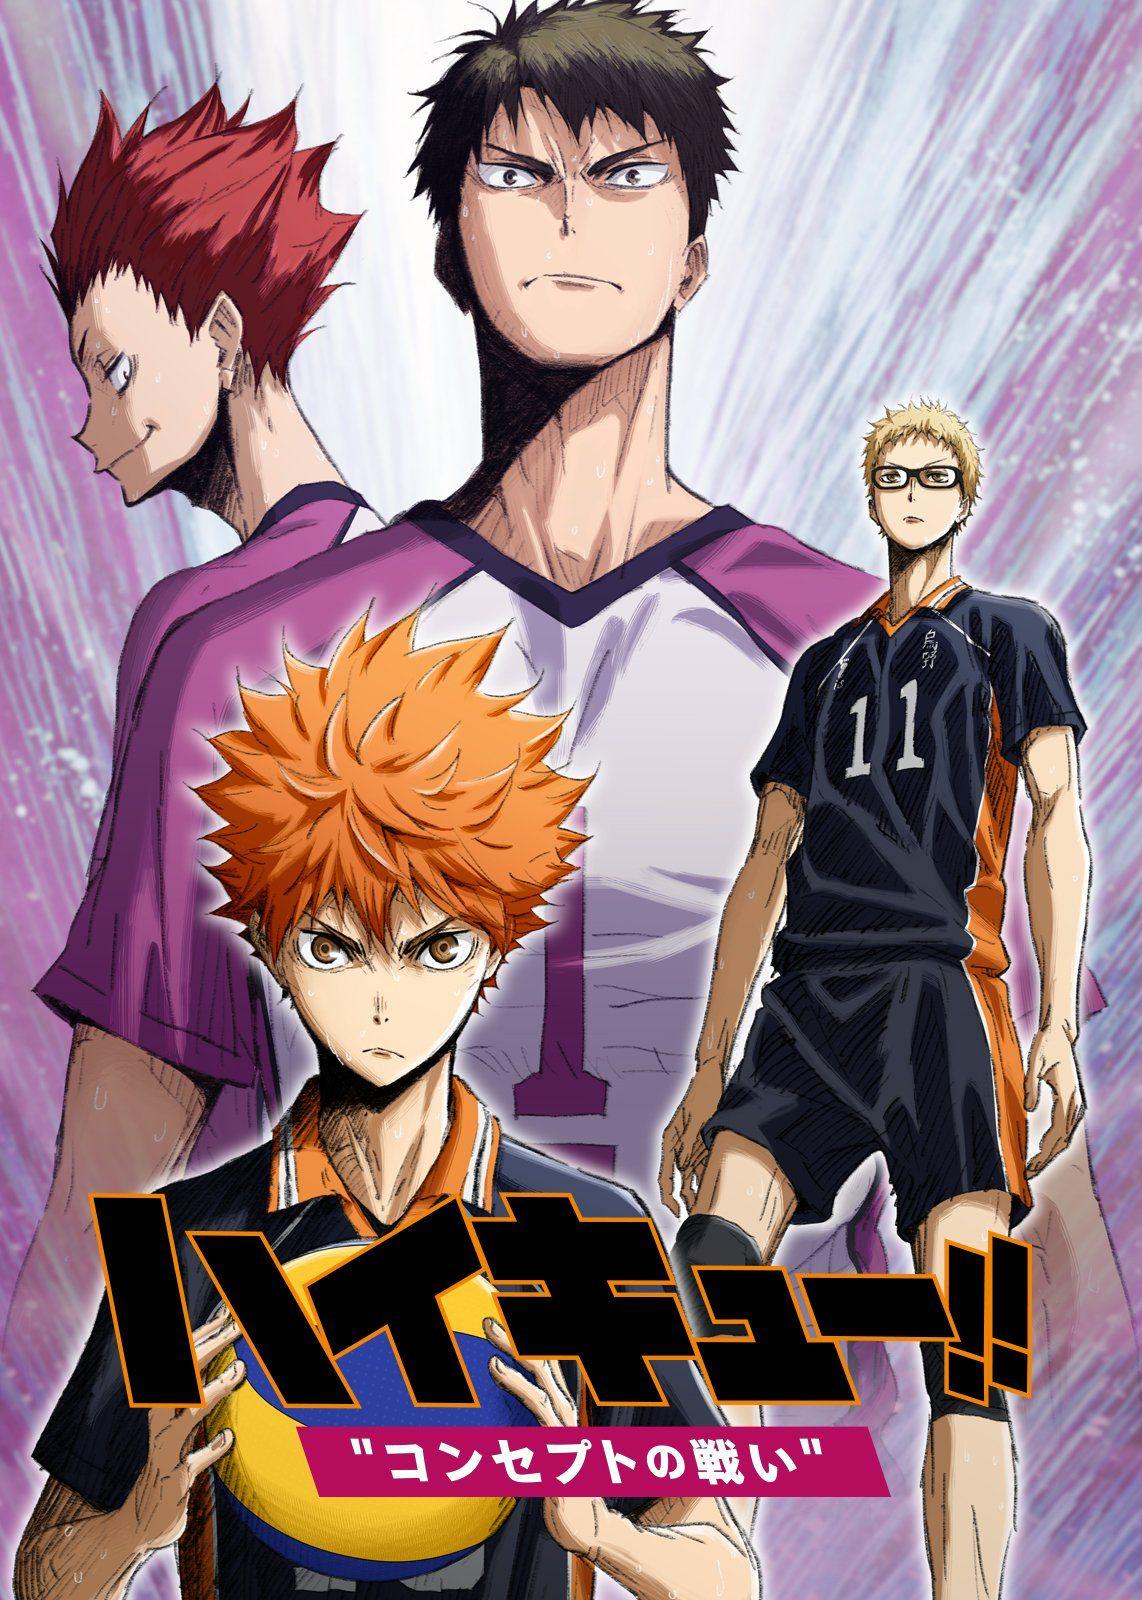 Pin de Anime News em Haikyuu 1080p